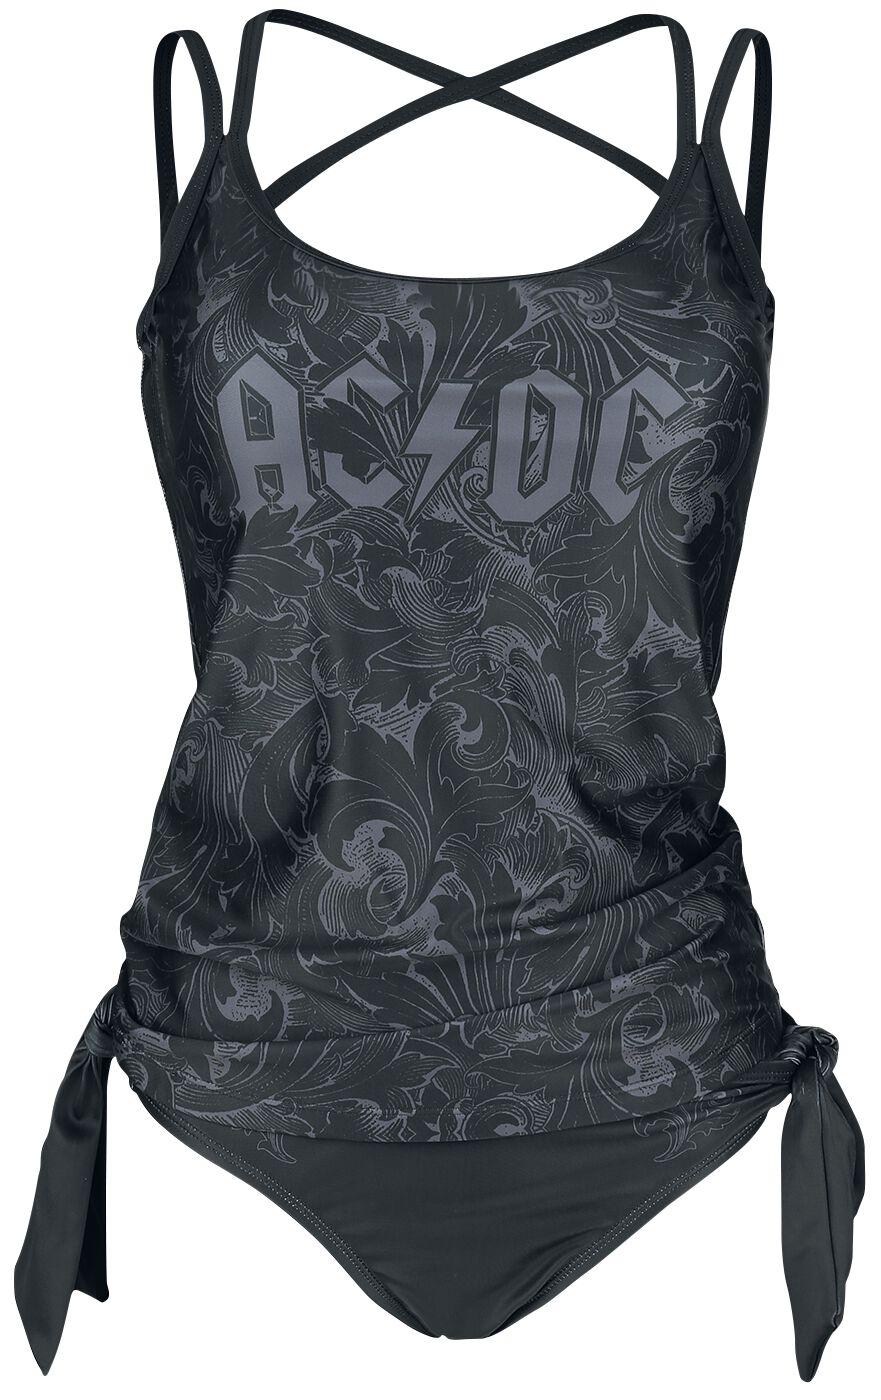 Bademode - AC DC EMP Signature Collection Badeanzug schwarz grau  - Onlineshop EMP